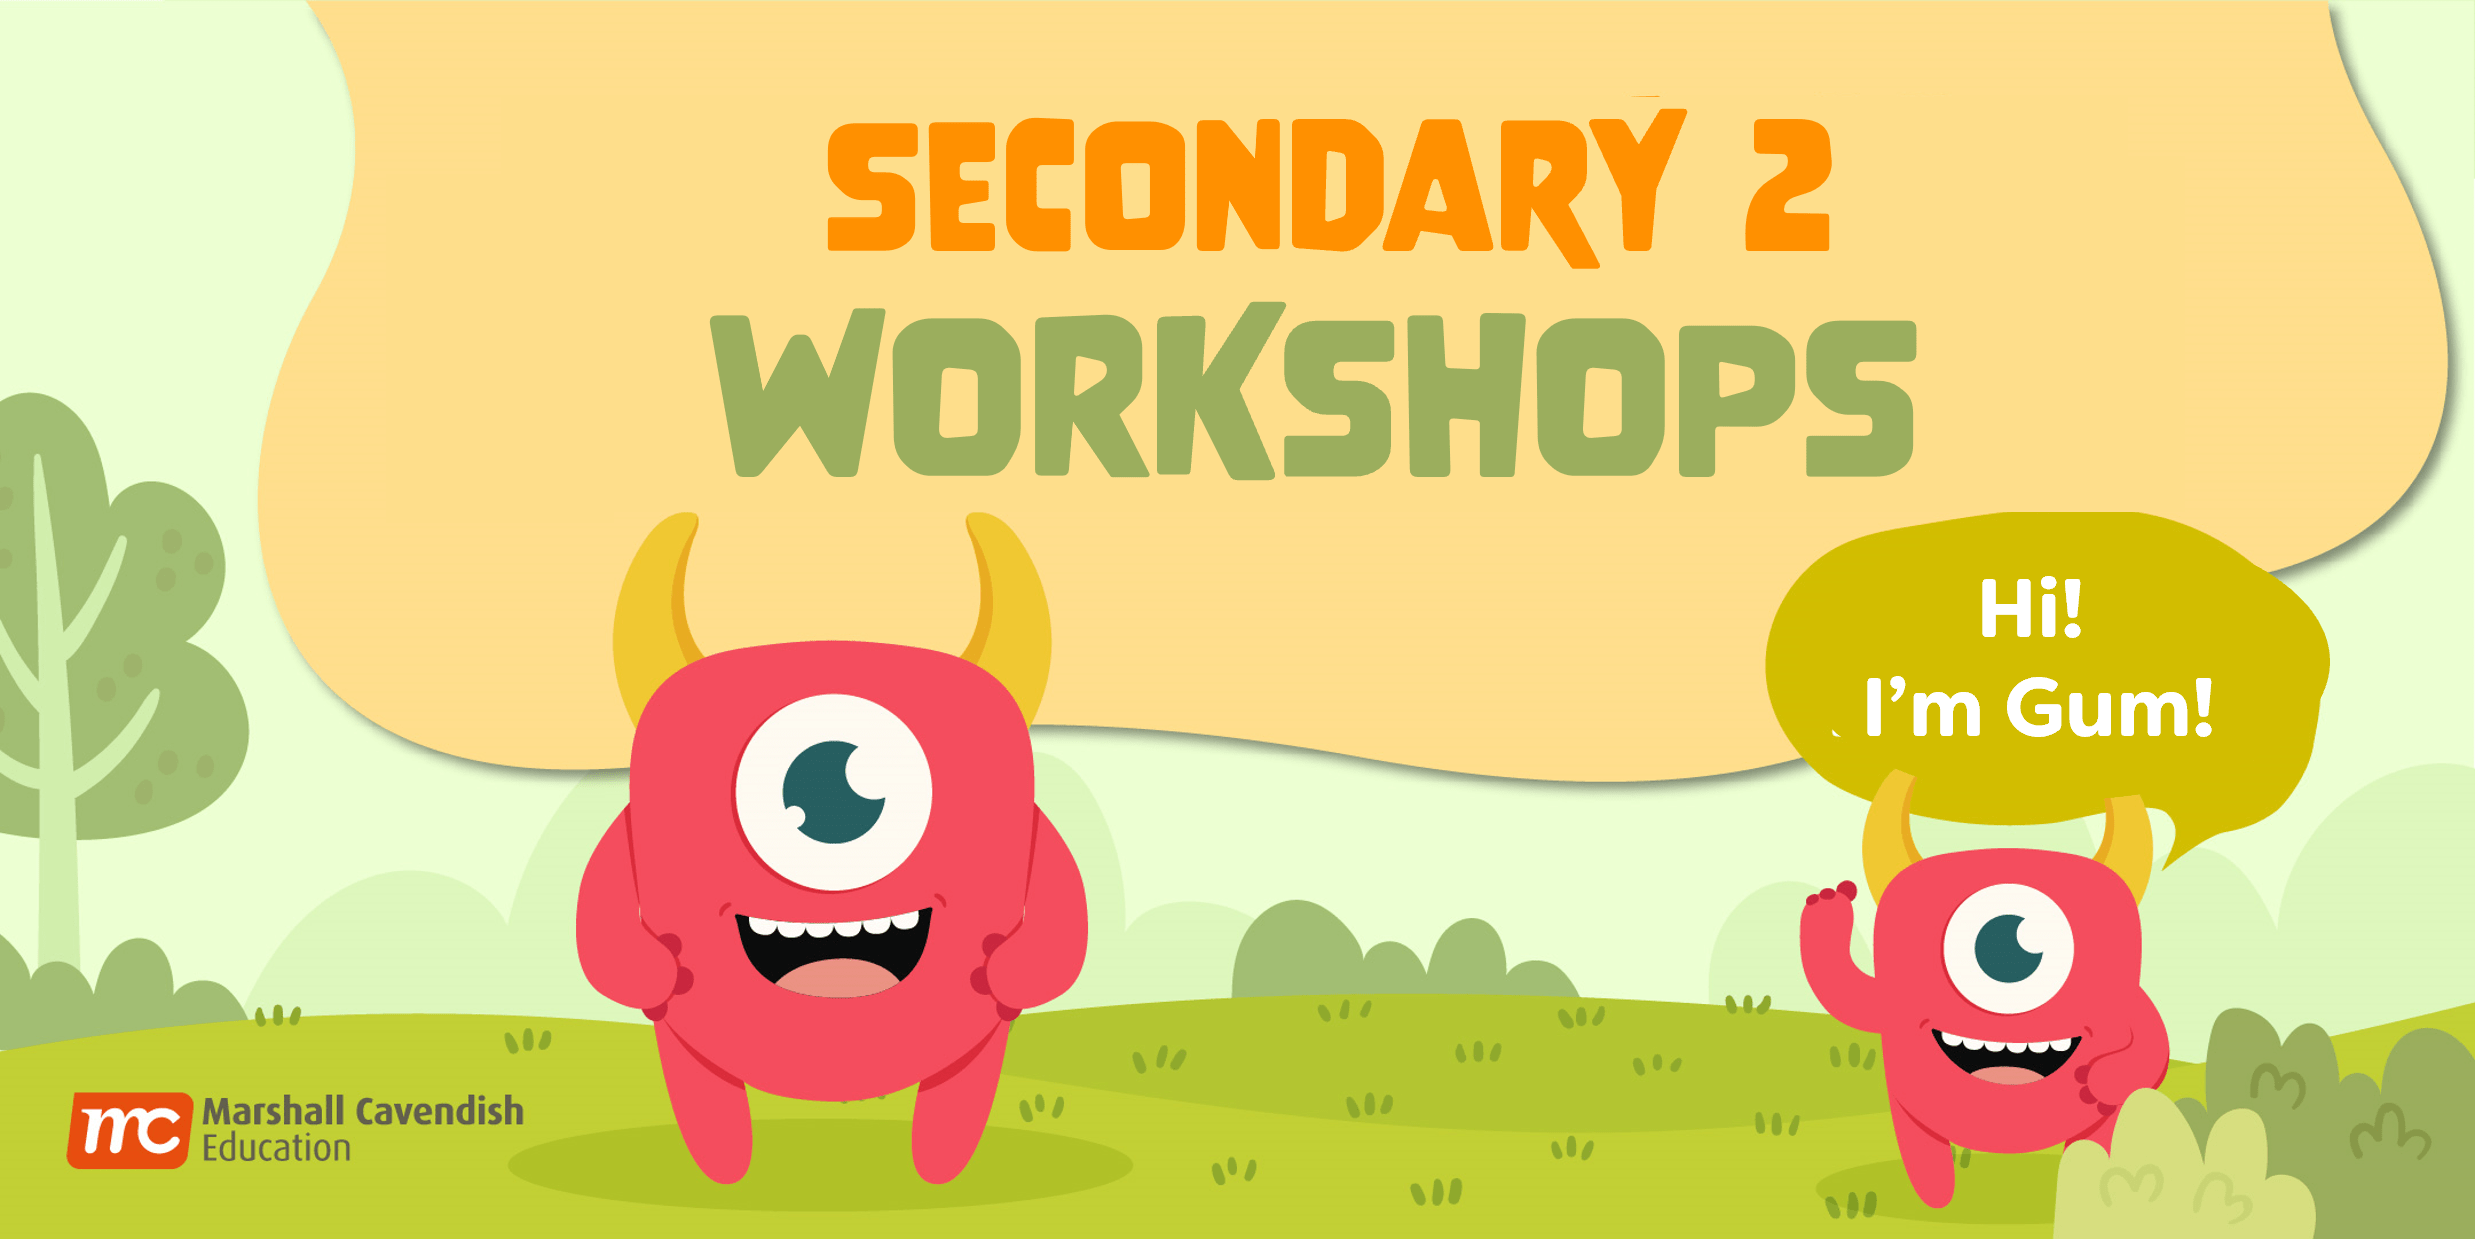 Secondary 2 Workshops